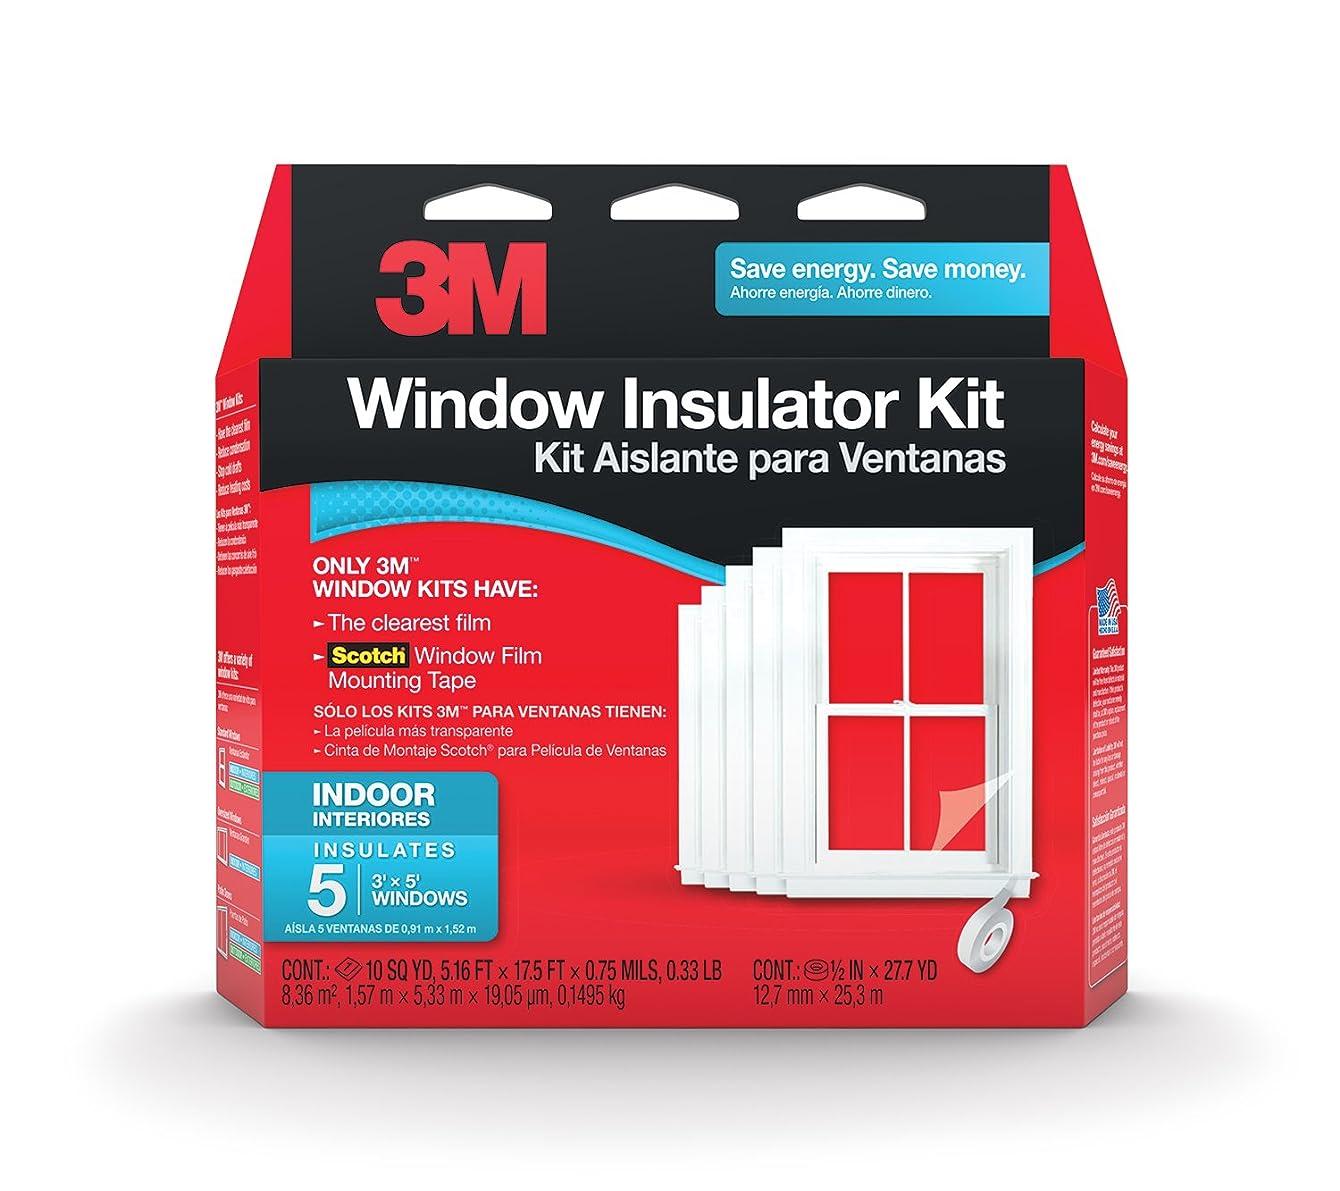 3M Indoor Window Insulator Kit fqnbihcfodsfb37